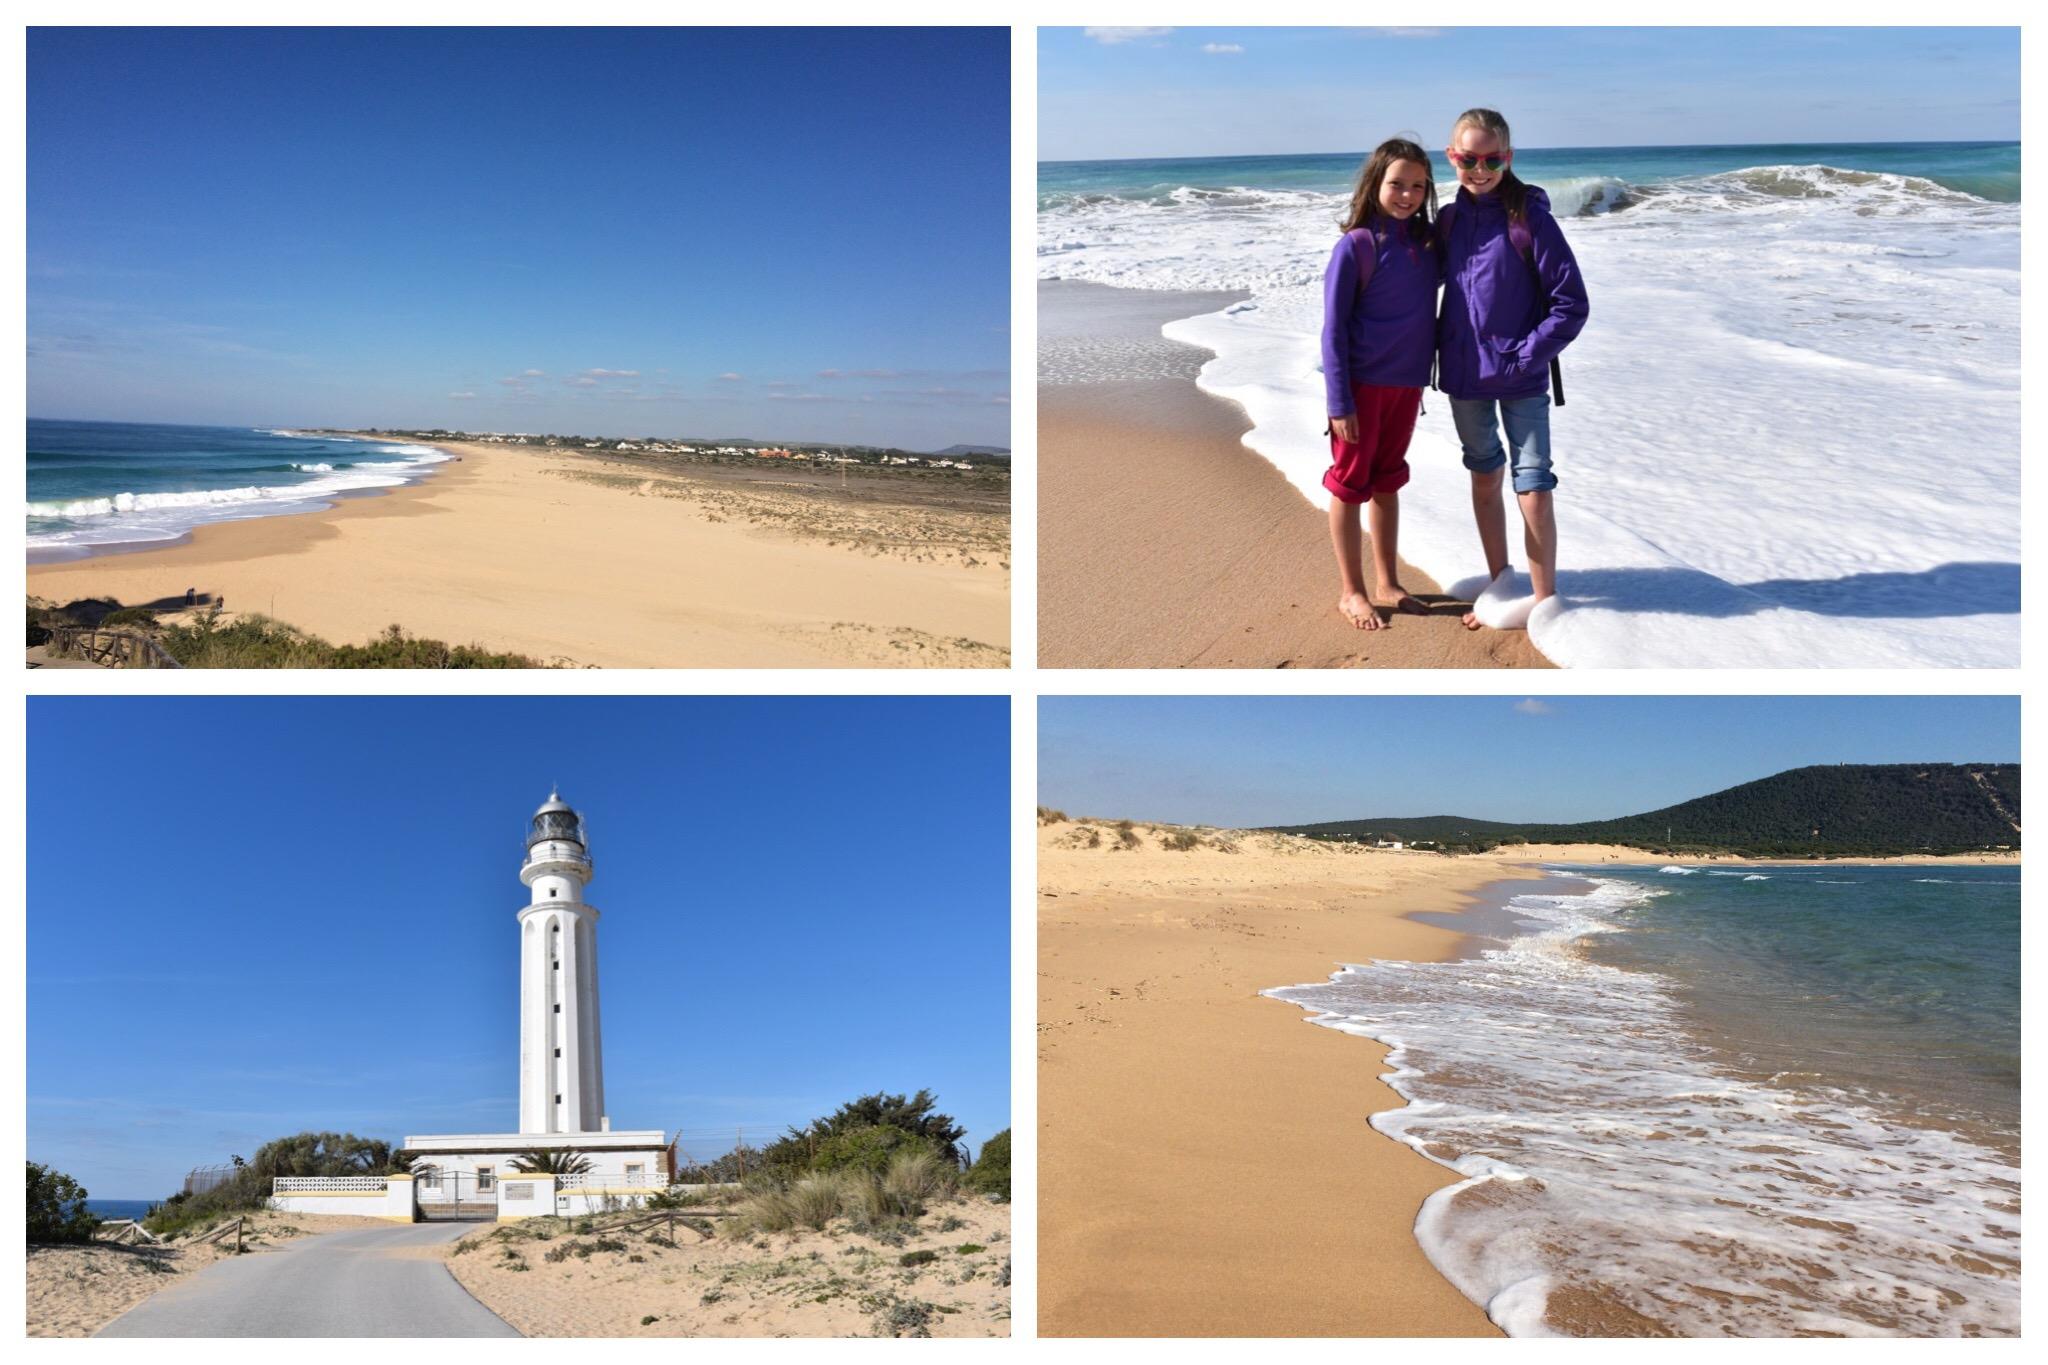 Cape Trafalgar - lighthouse and beaches